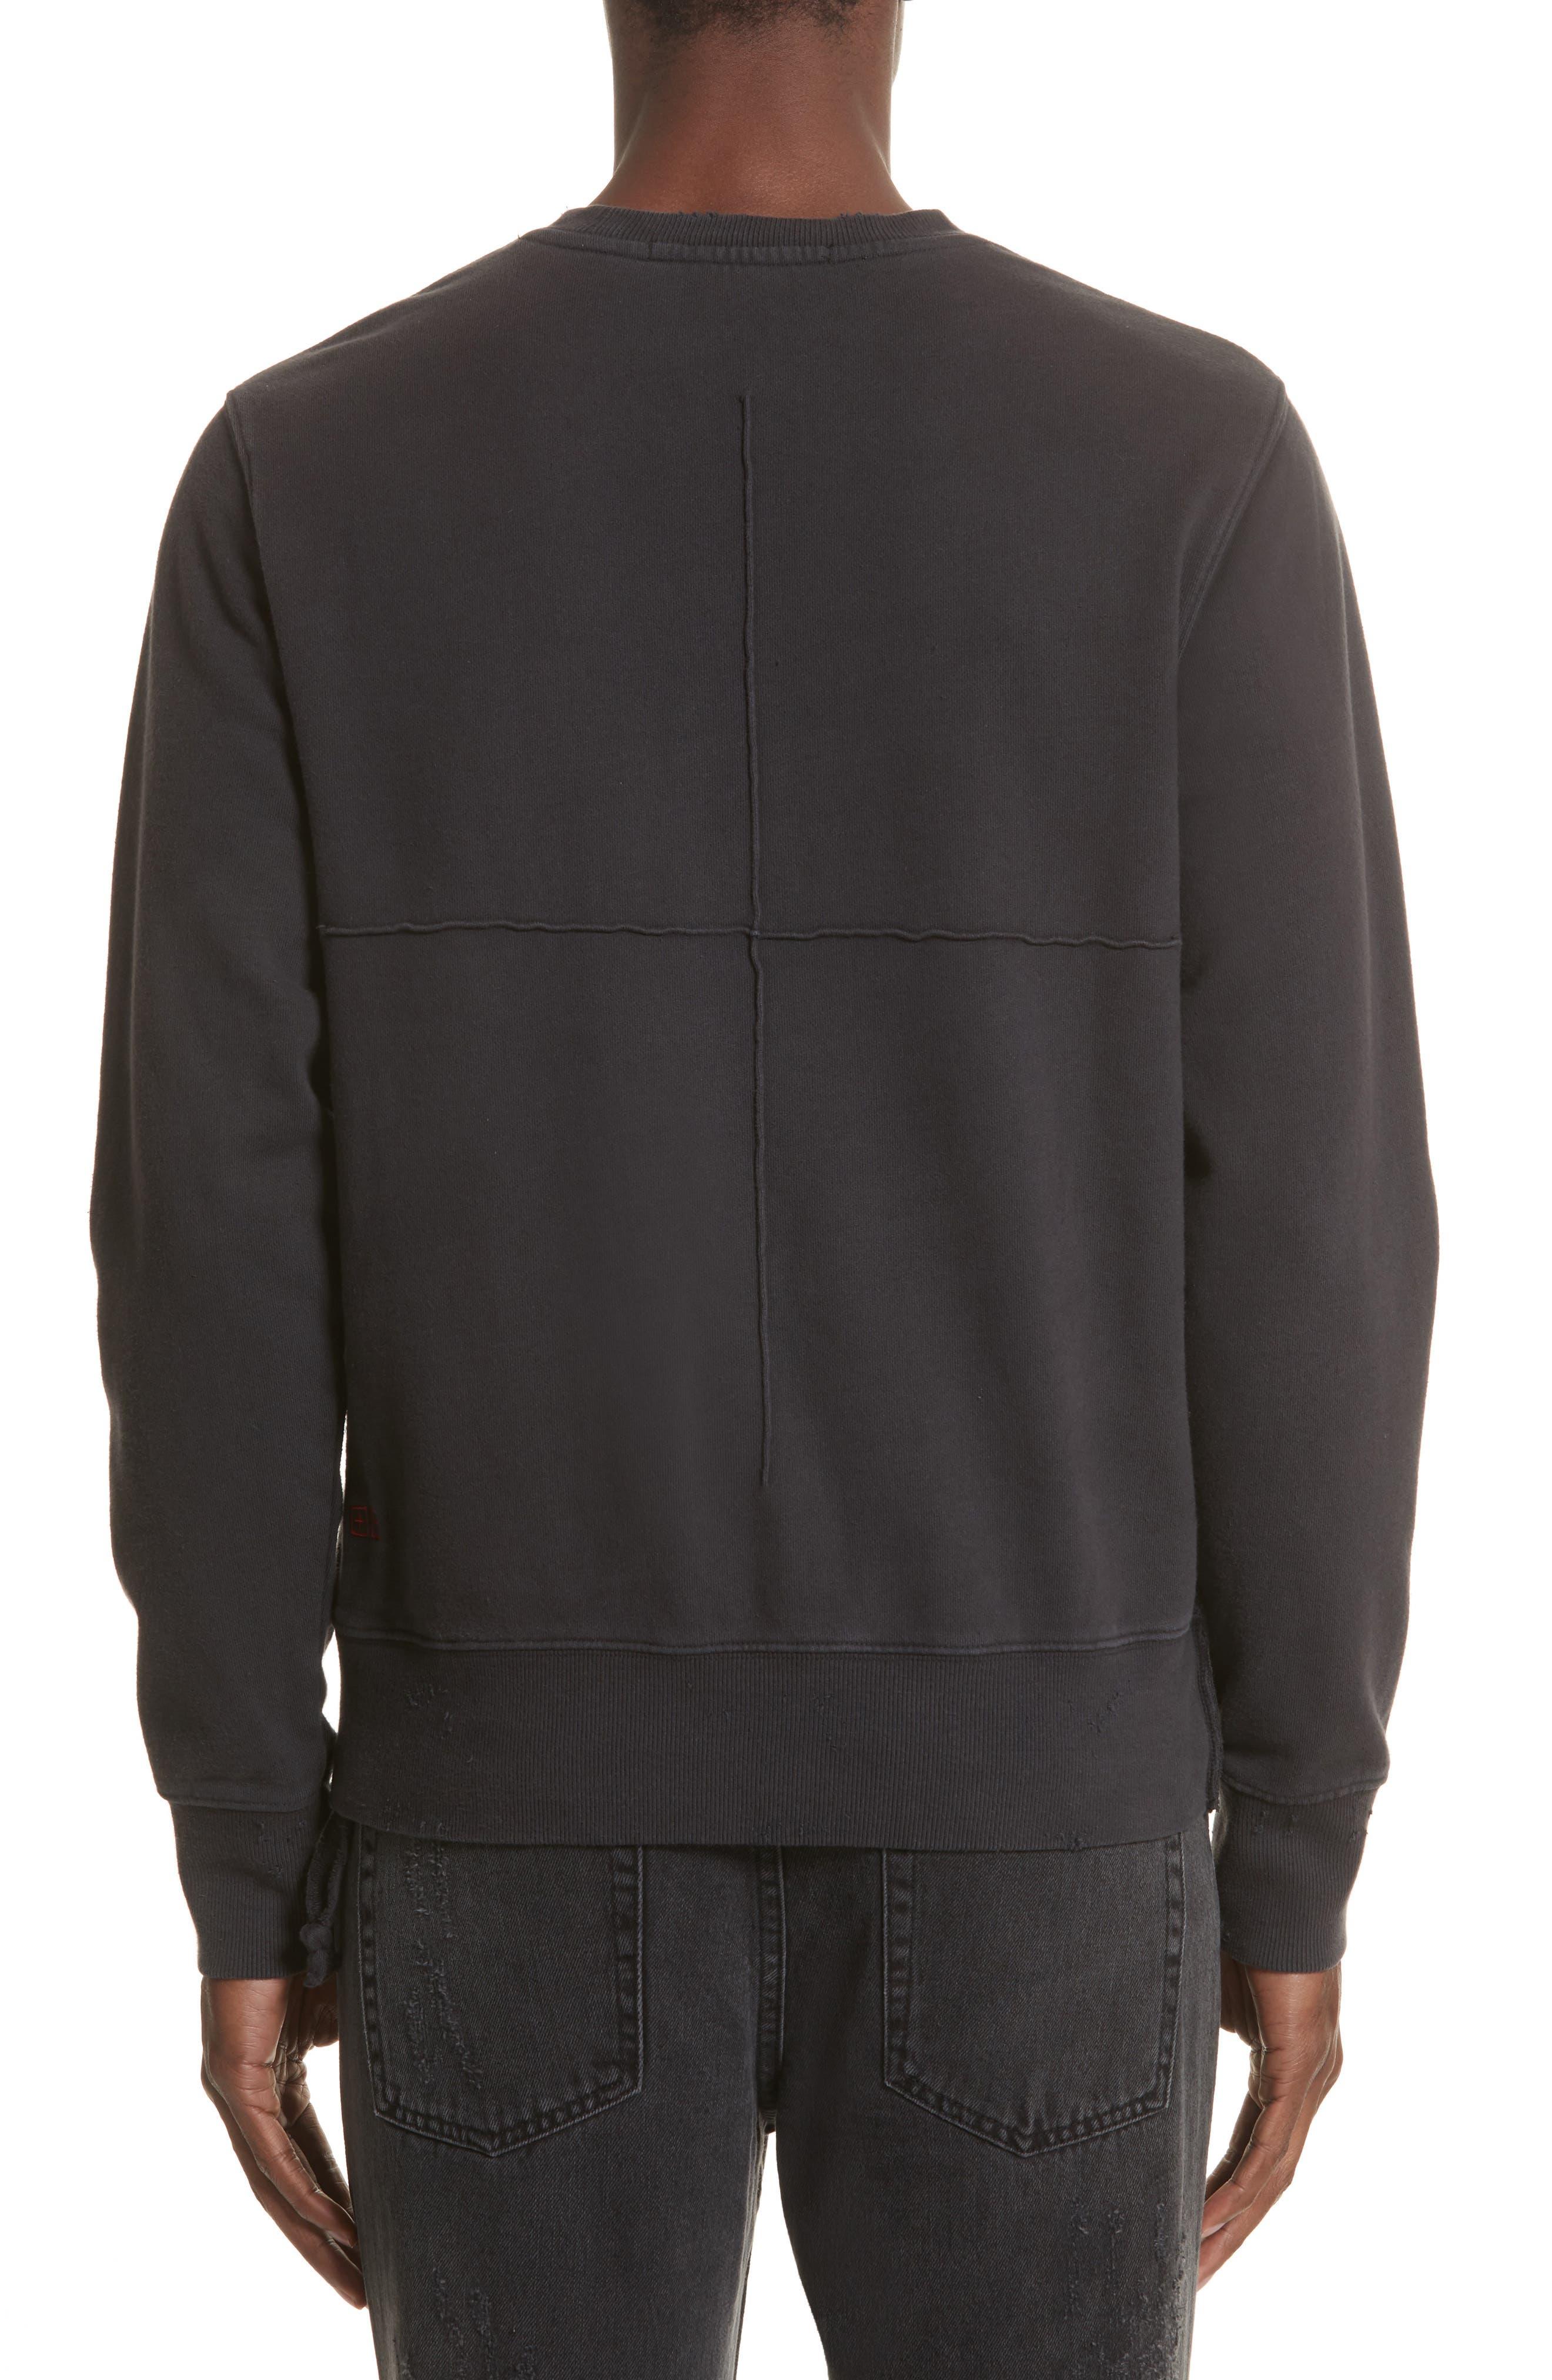 Pins Distressed Sweatshirt,                             Alternate thumbnail 2, color,                             Black